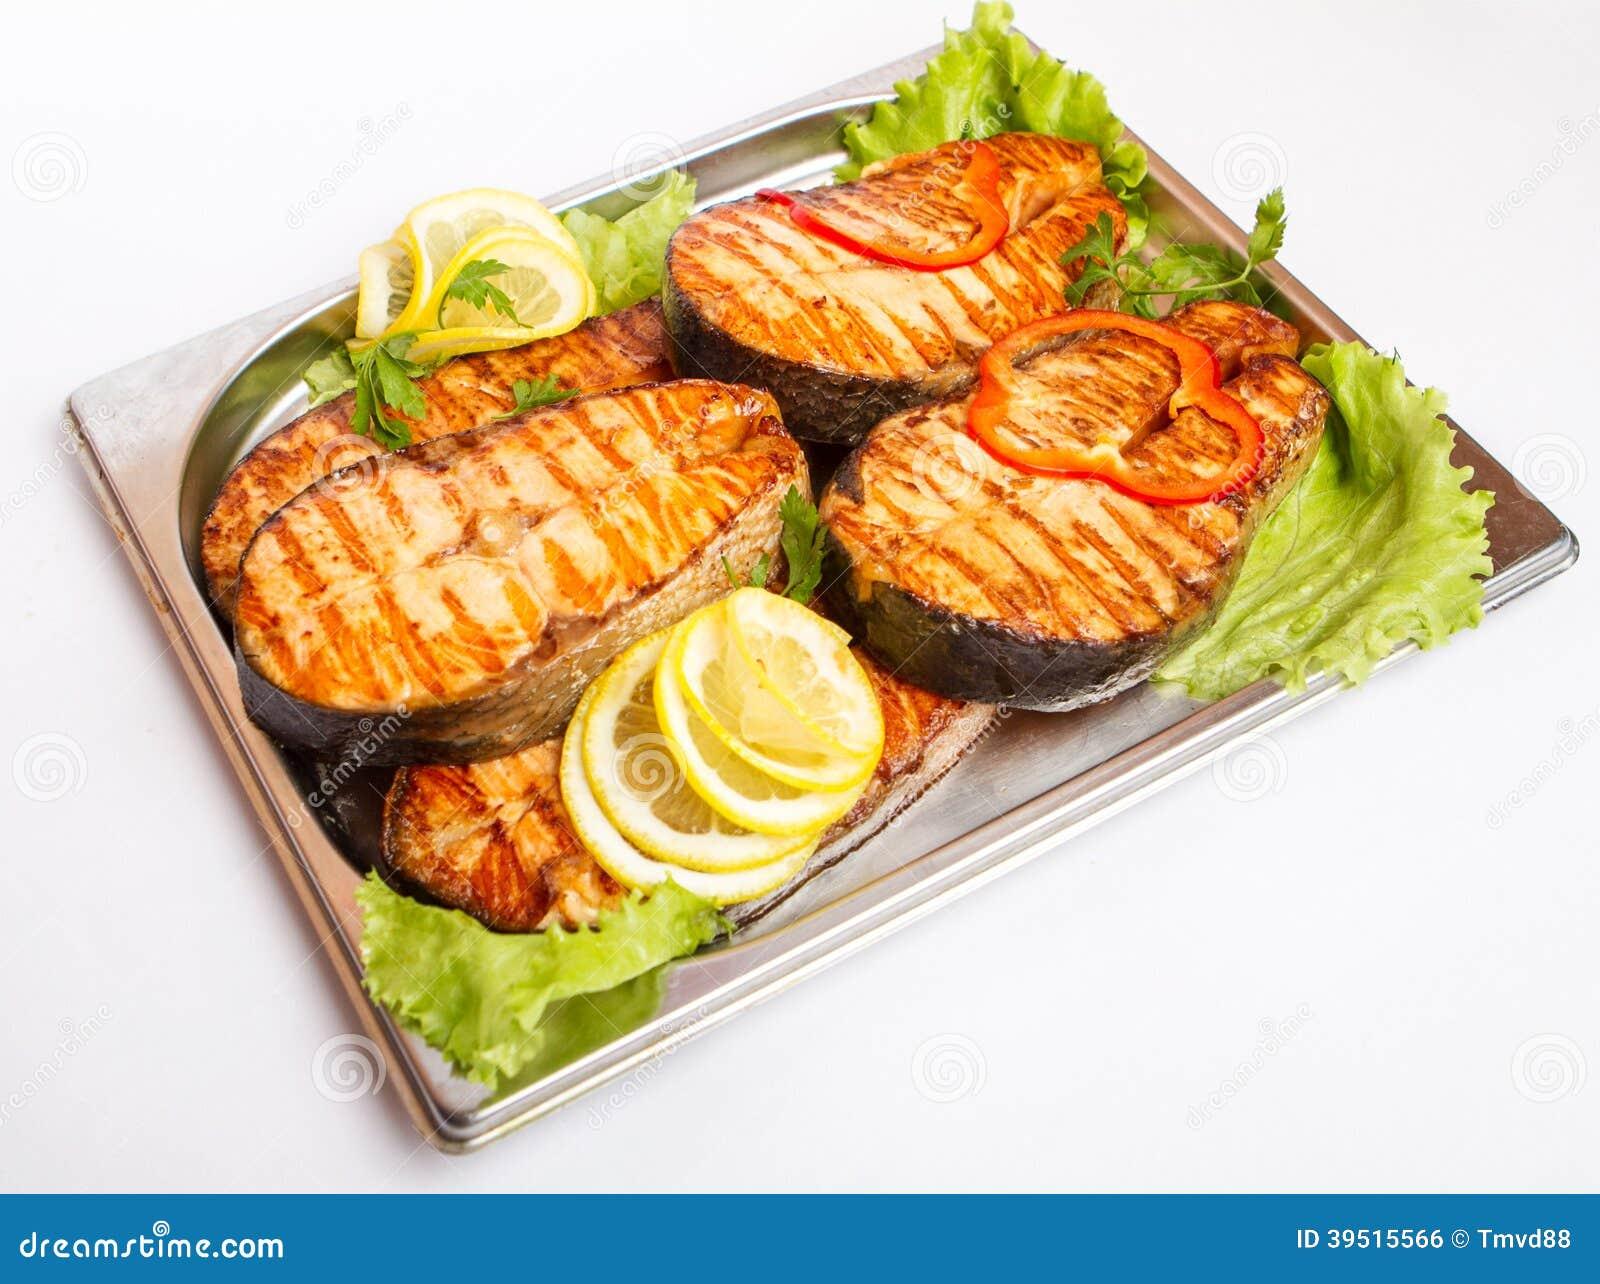 Fish fried fish